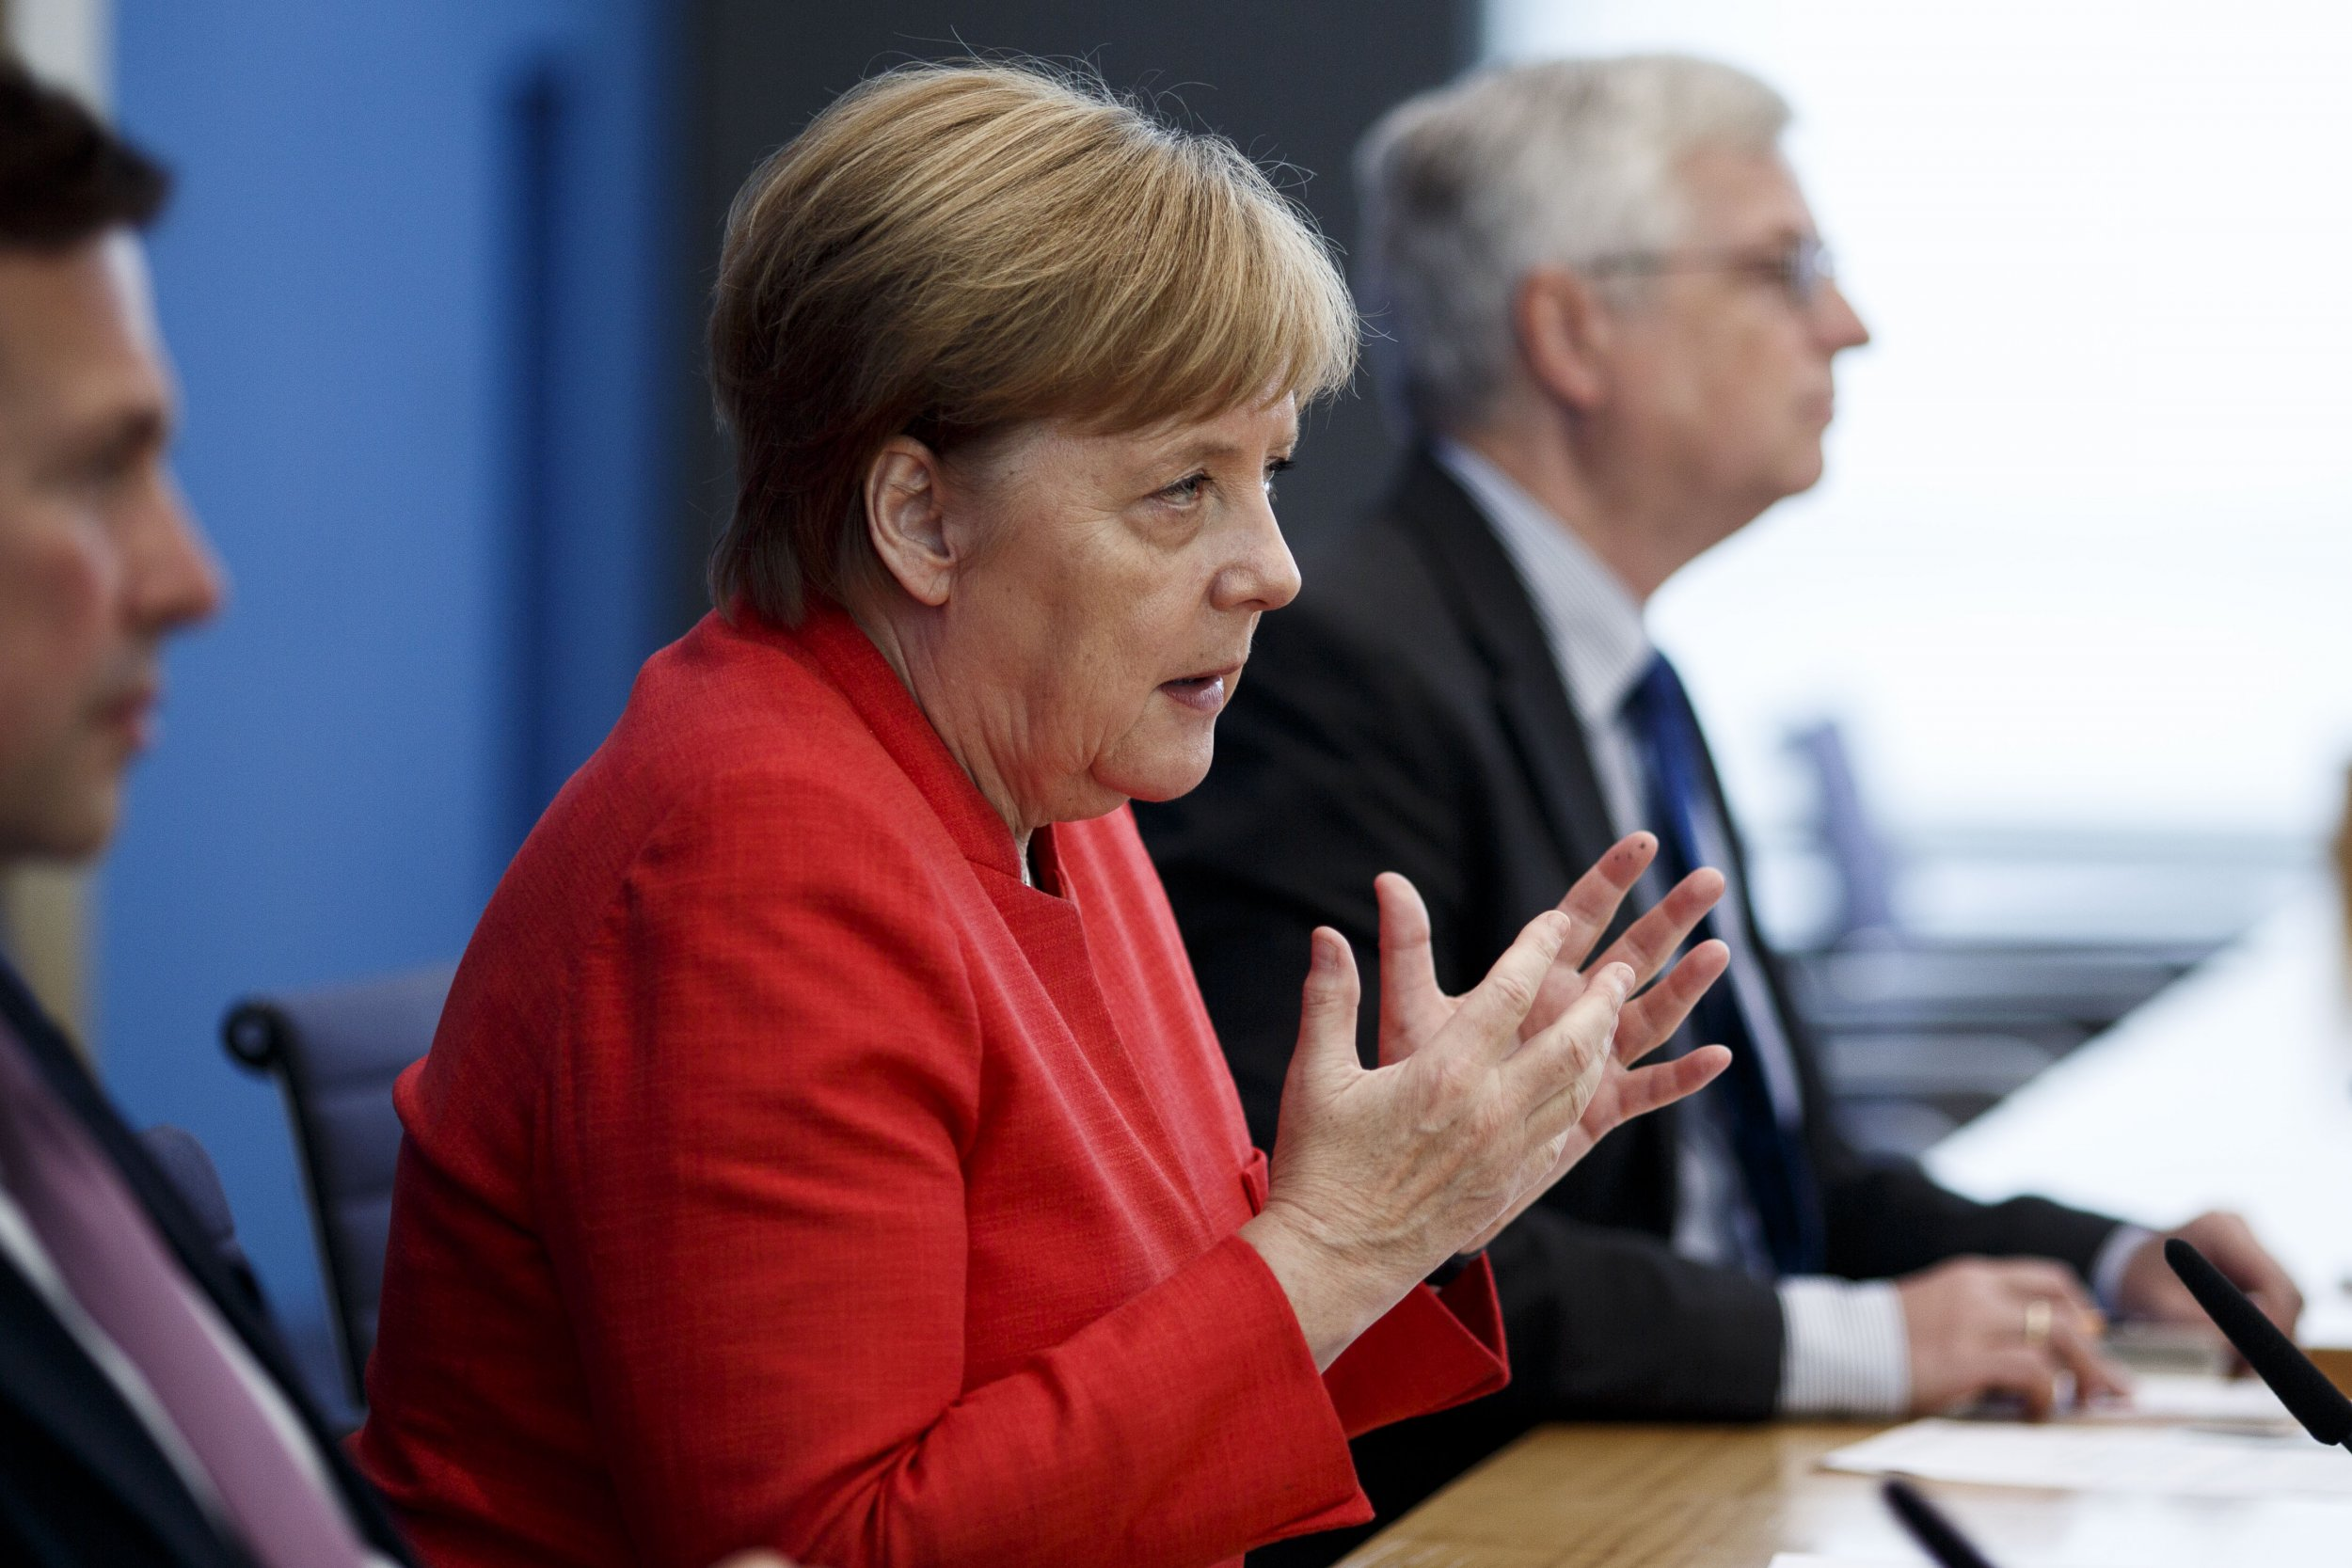 07_20_Merkel